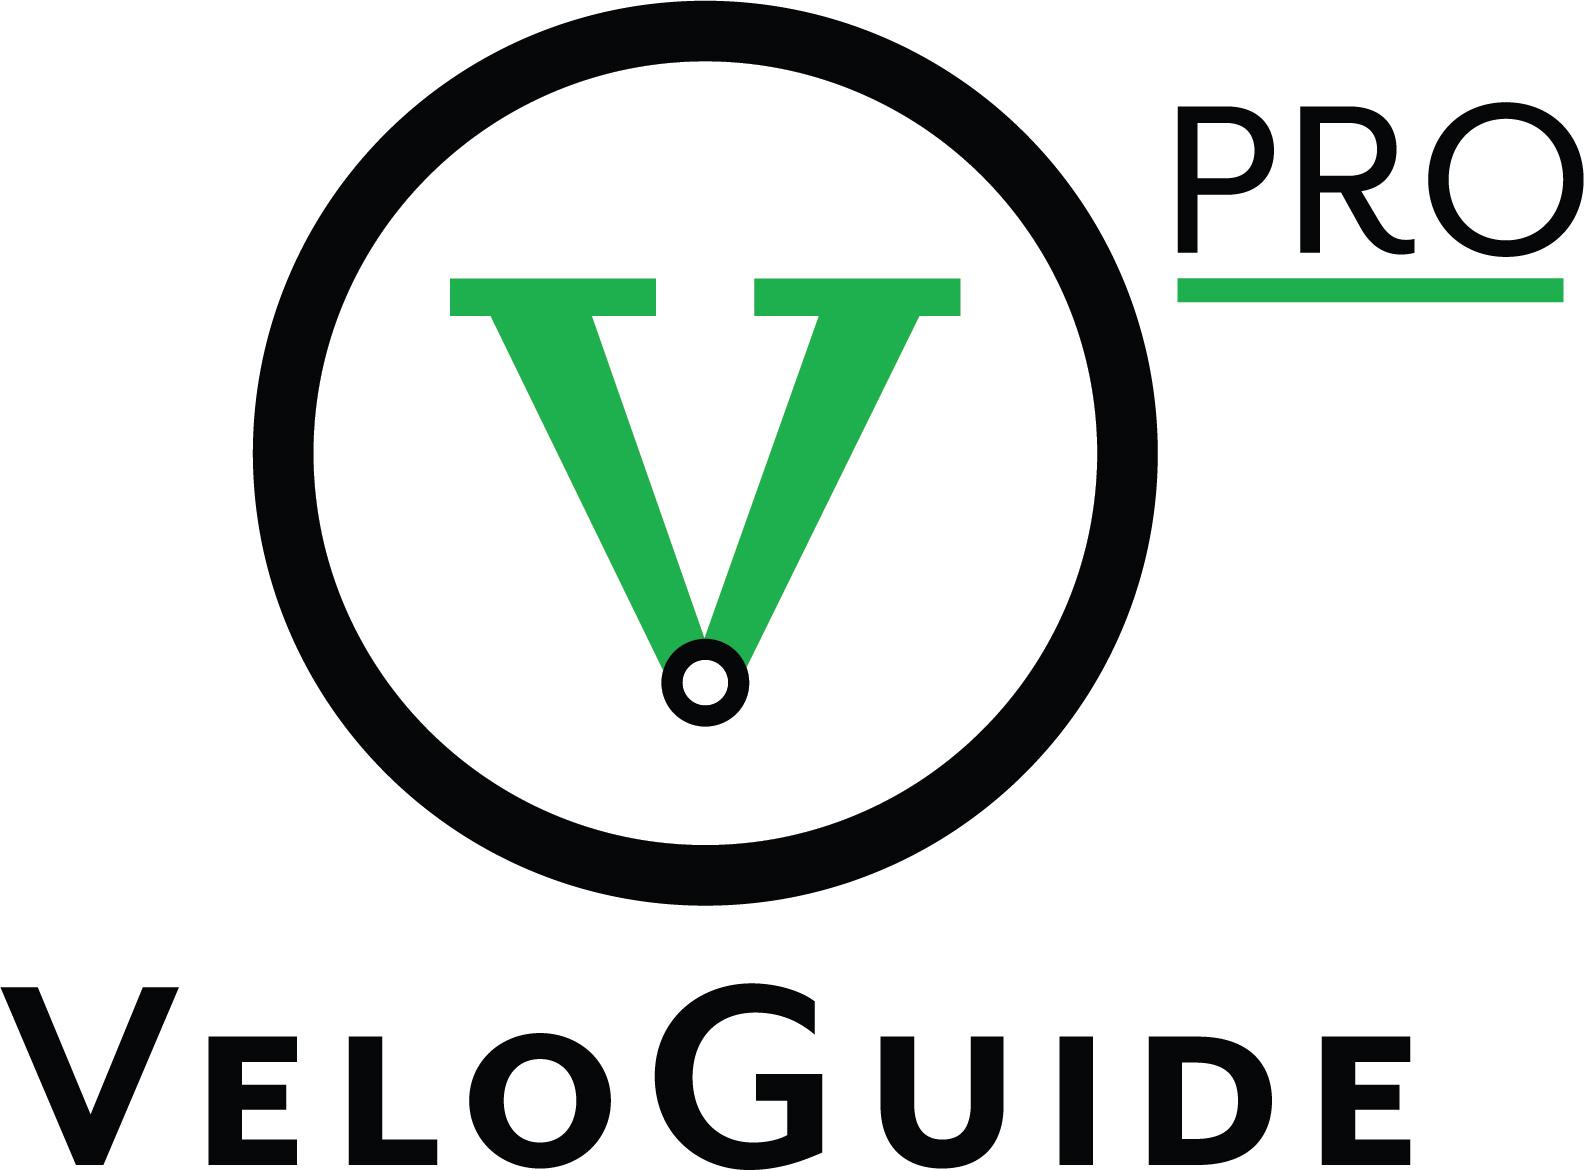 VeloGuide Pro logo